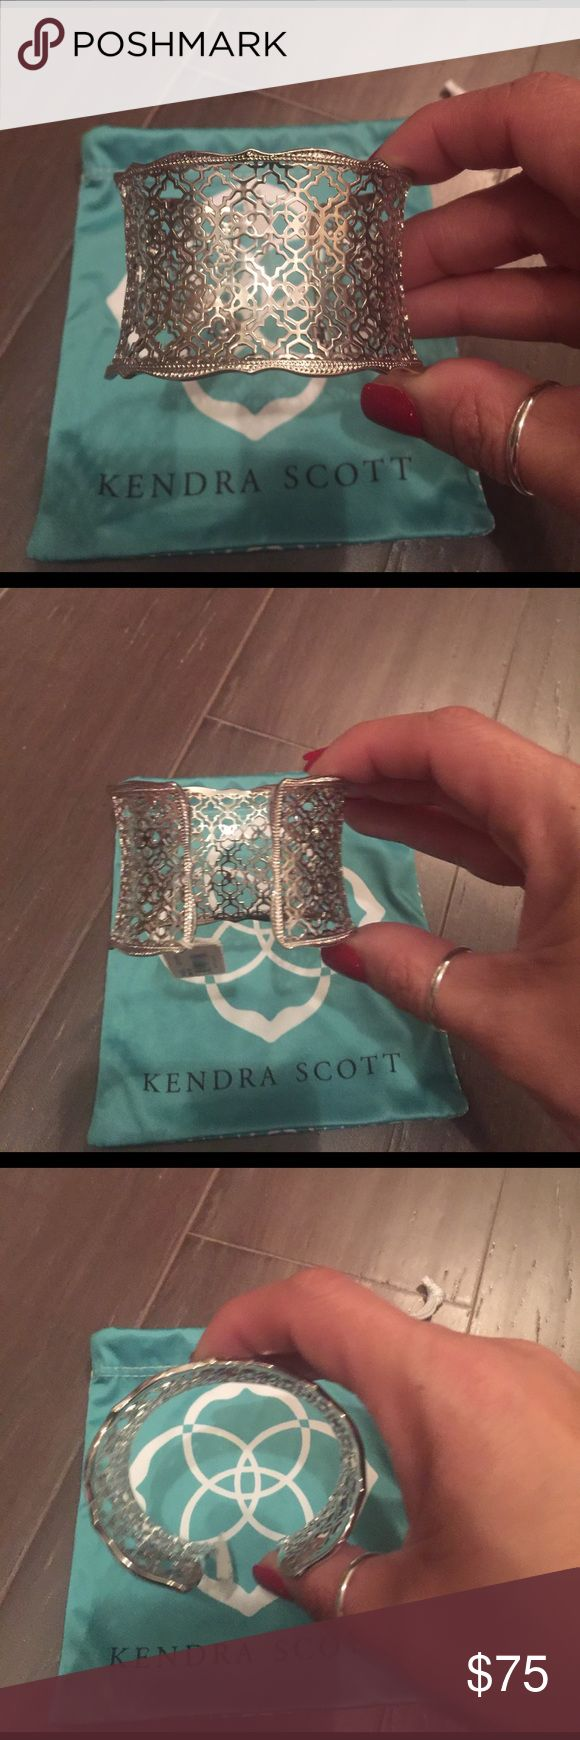 Kendra Scott Candice Bracelet Kendra Scott Candice Bracelet. Never worn. All silver. Please check my closet for matching earrings. Kendra Scott Jewelry Bracelets